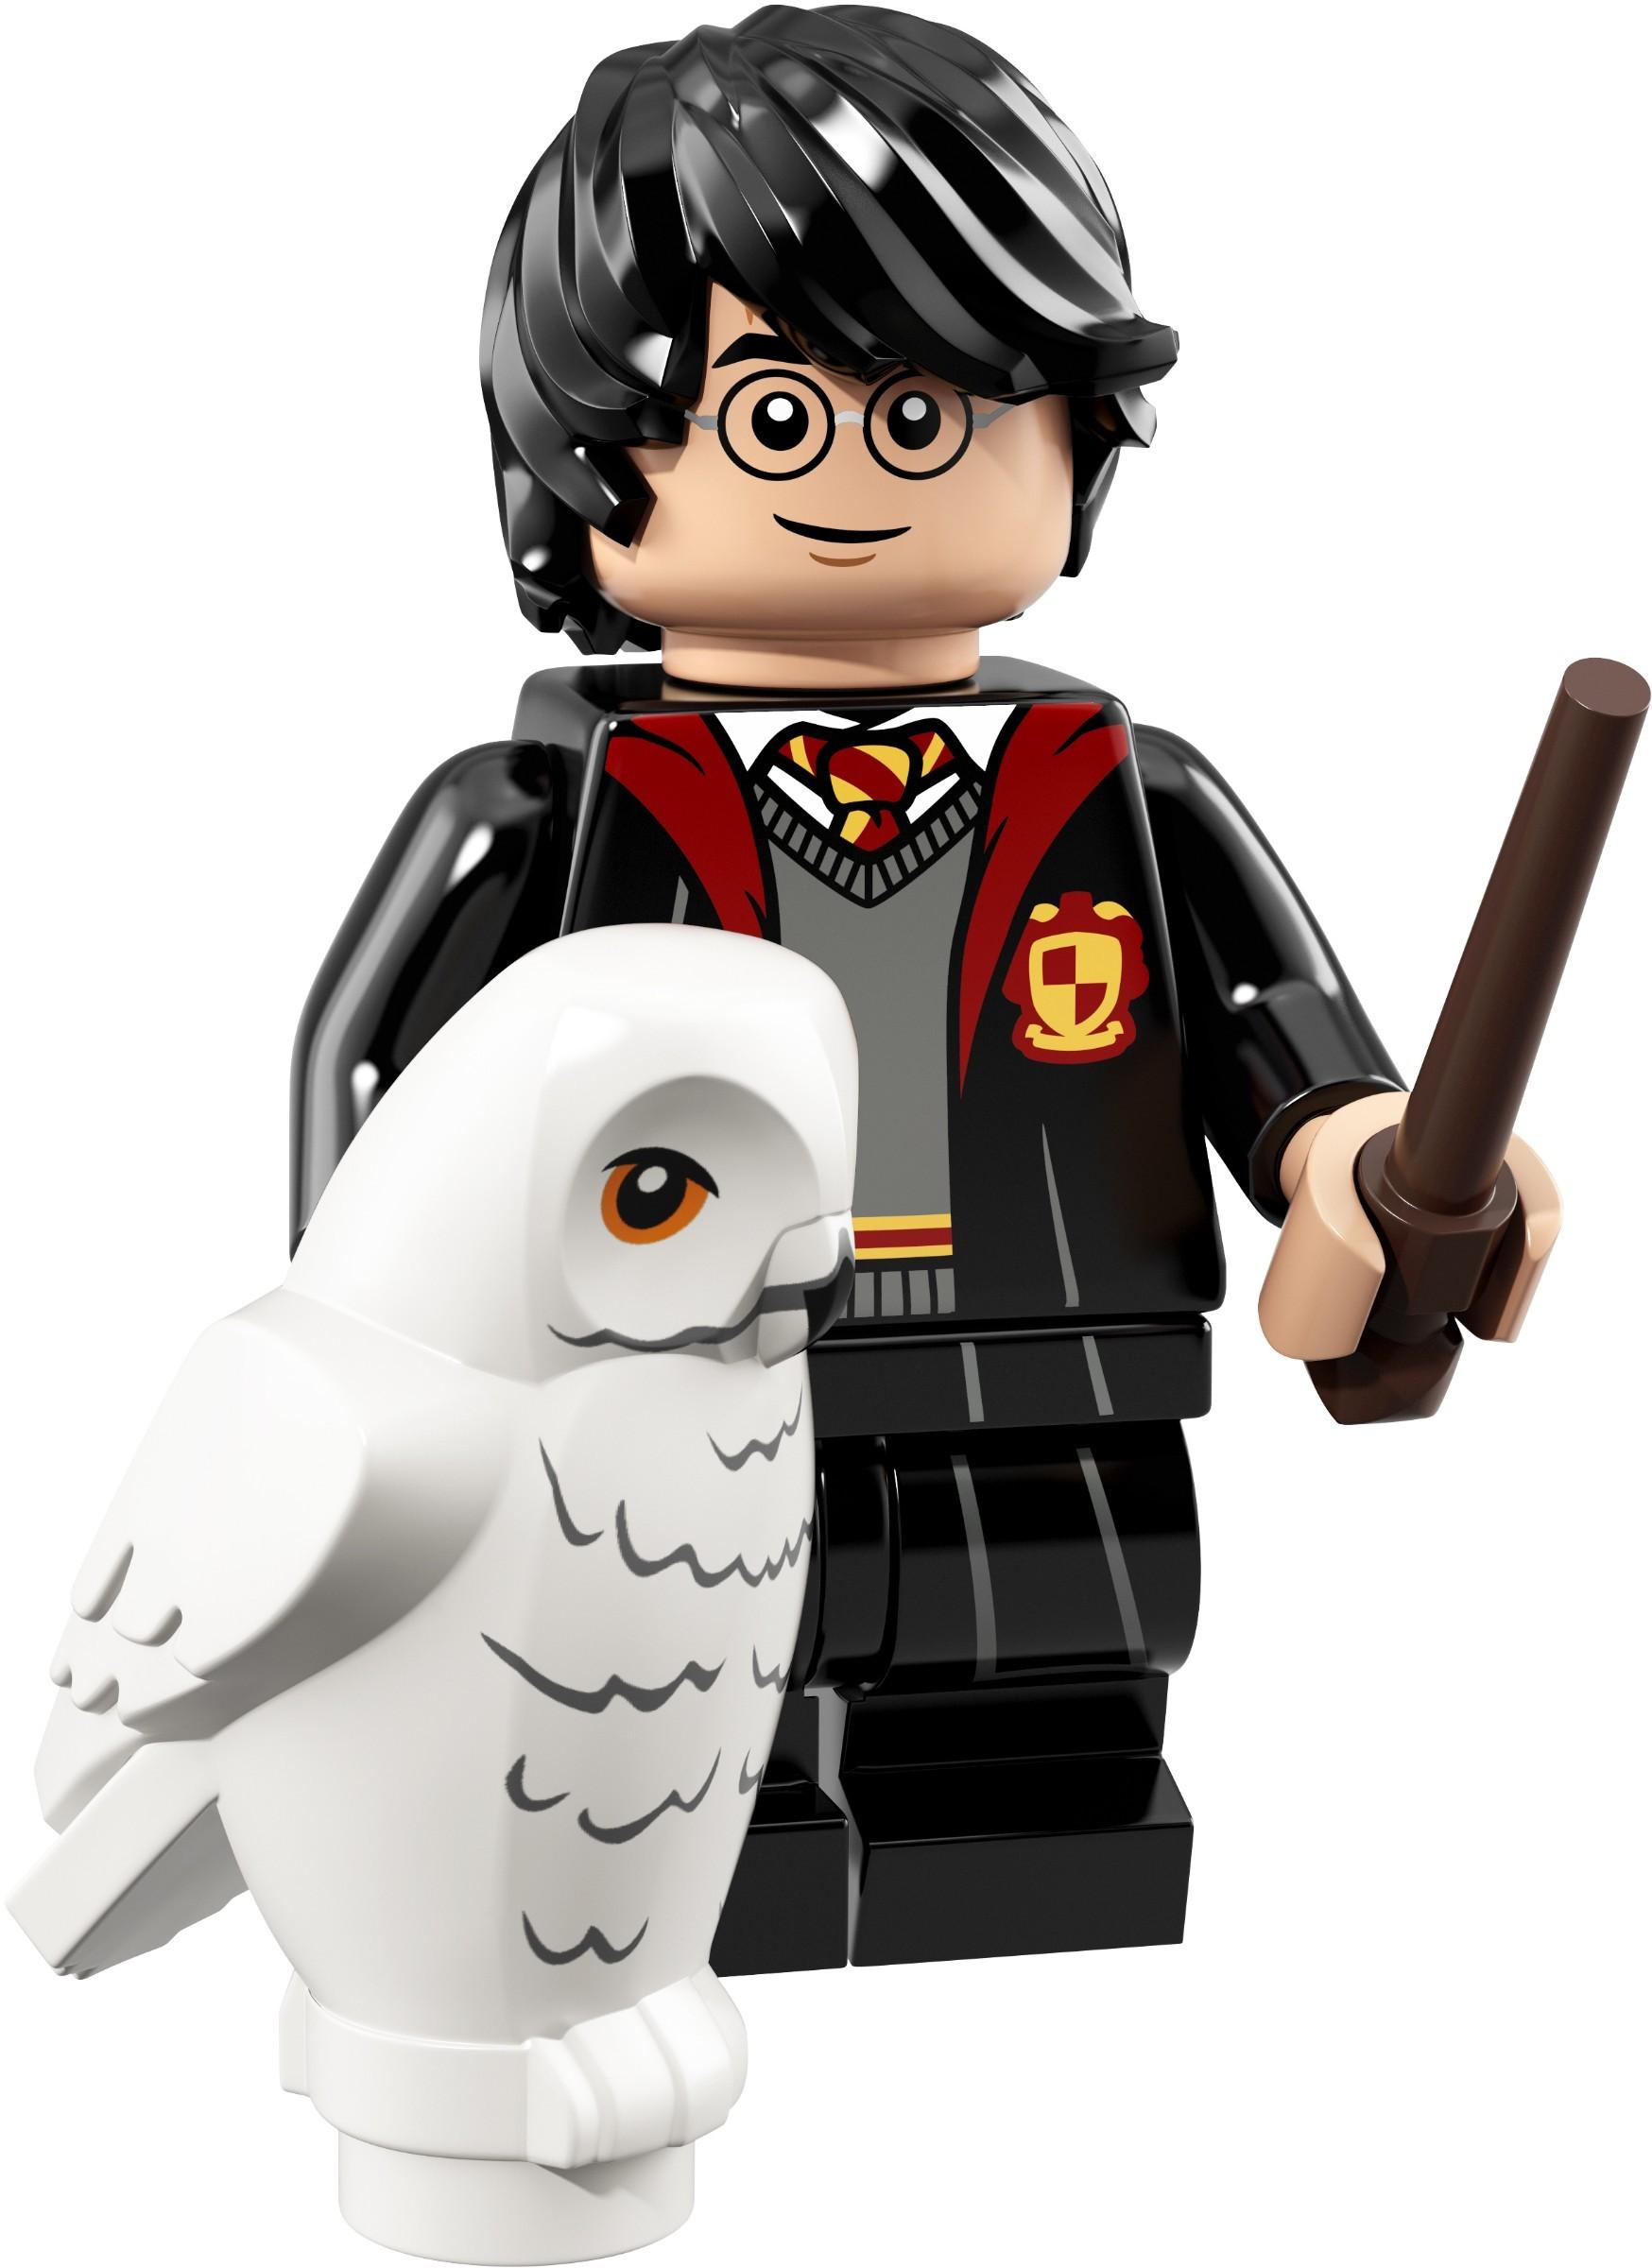 PotterPotter 71022 Minifigure Lego® Série Harry 2eWb9IEDHY